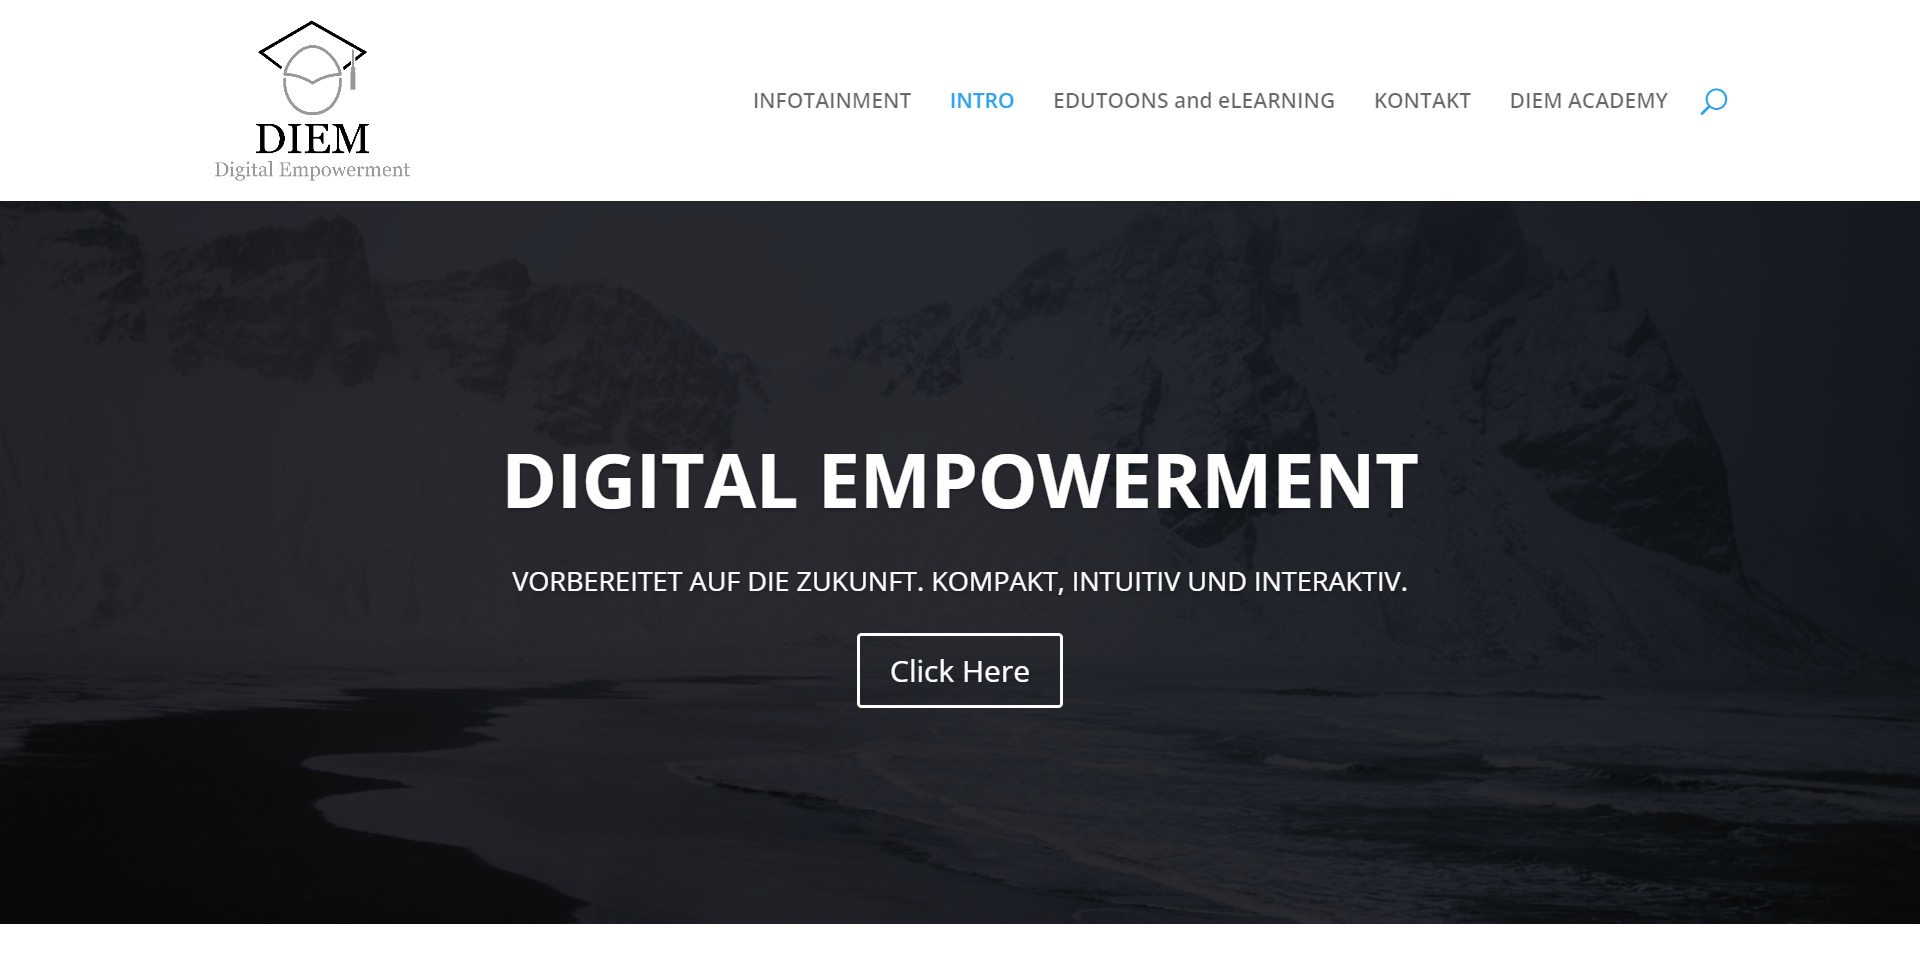 digital empowerment shot